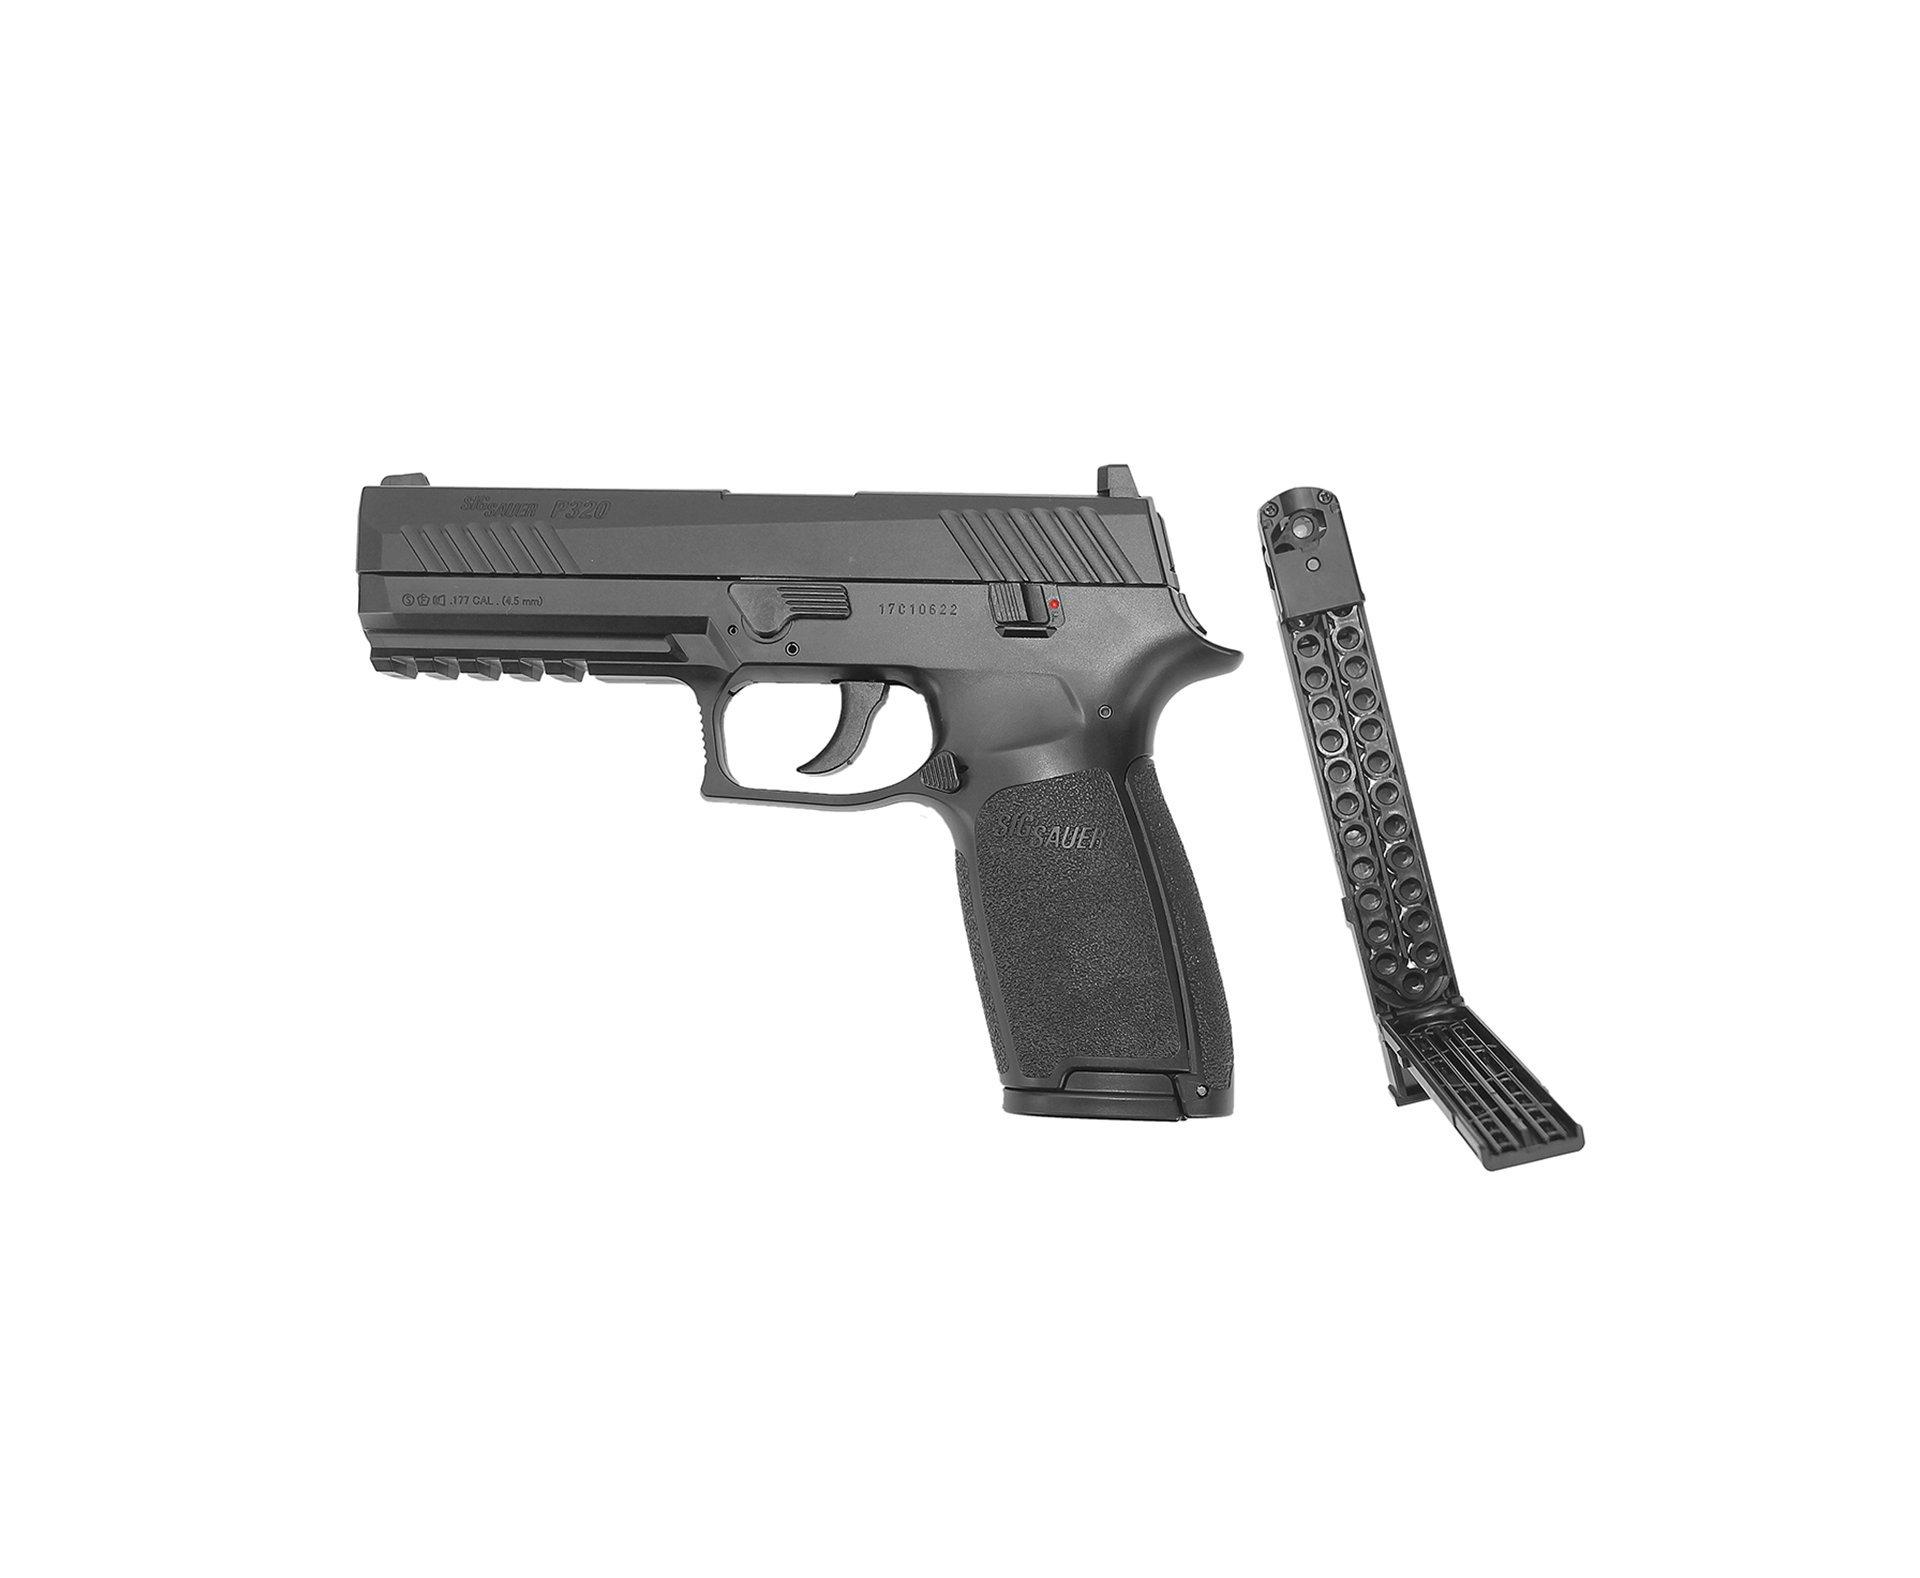 Pistola Pressão Sig Sauer P320 Gas Co2 4,5mm 30 Tiros Blowback